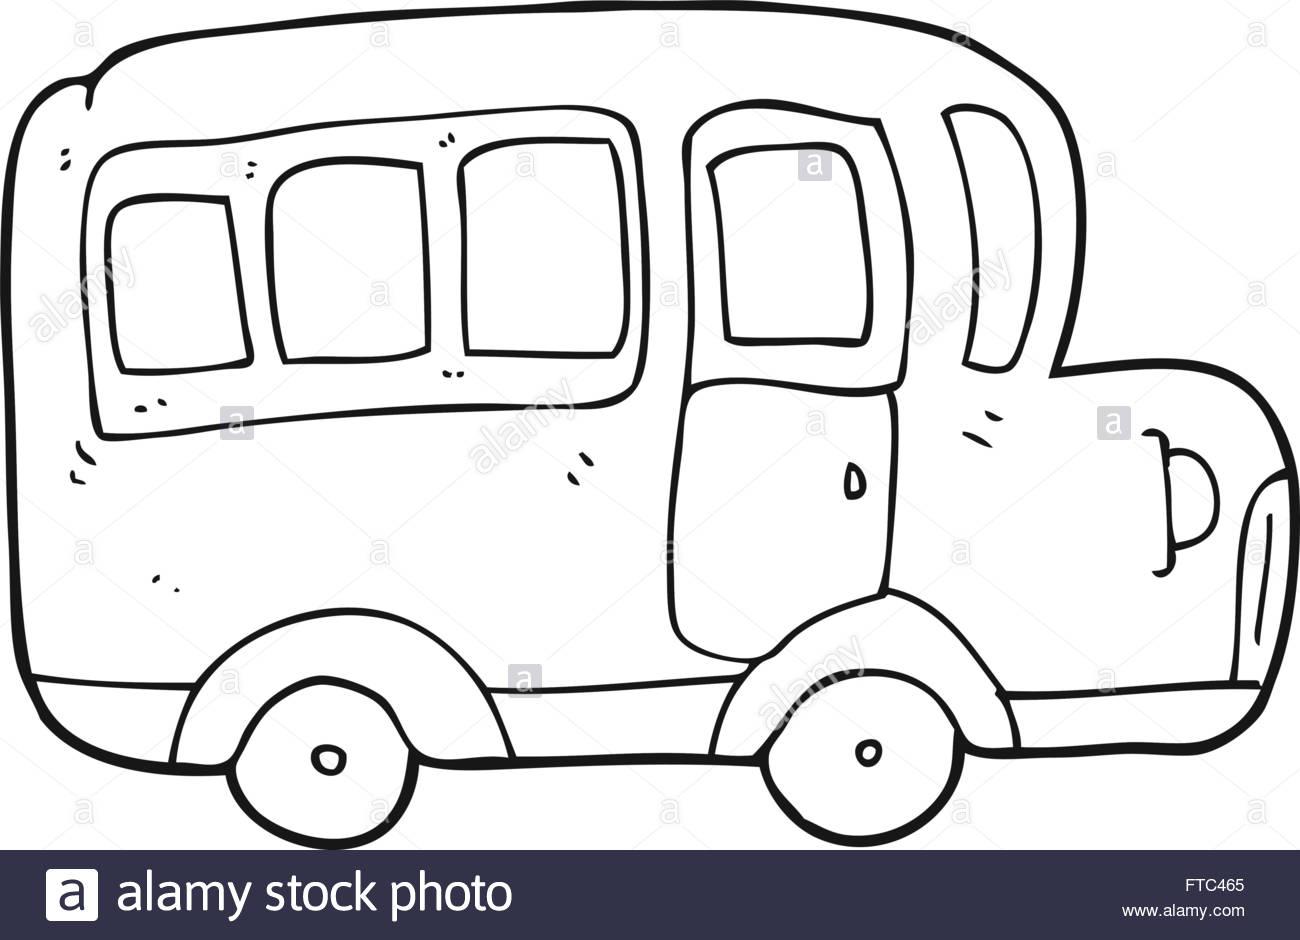 1300x940 Freehand Drawn Black And White Cartoon Yellow School Bus Stock